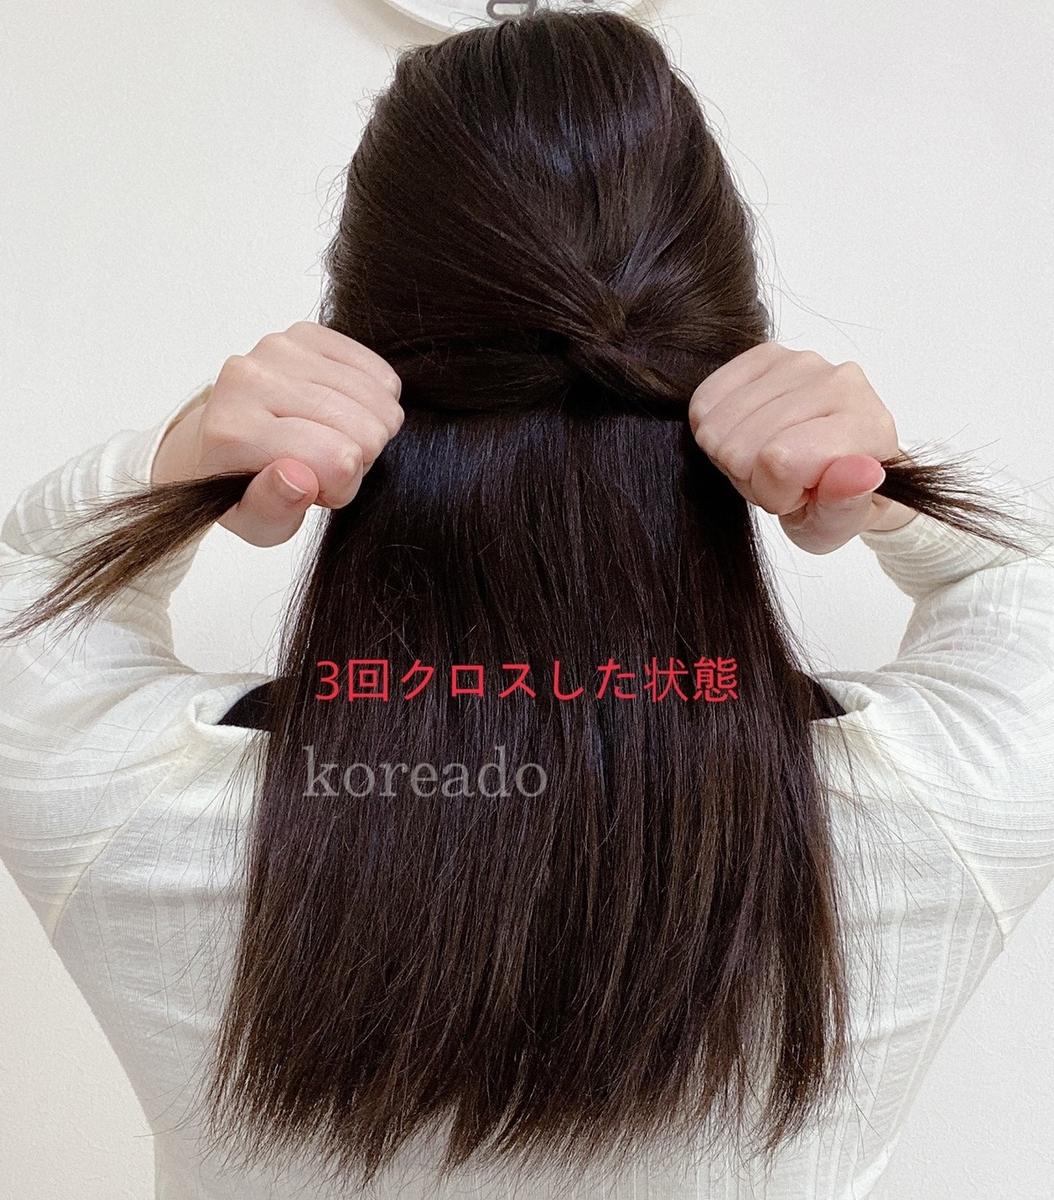 f:id:i-love-korea:20210424172951j:plain